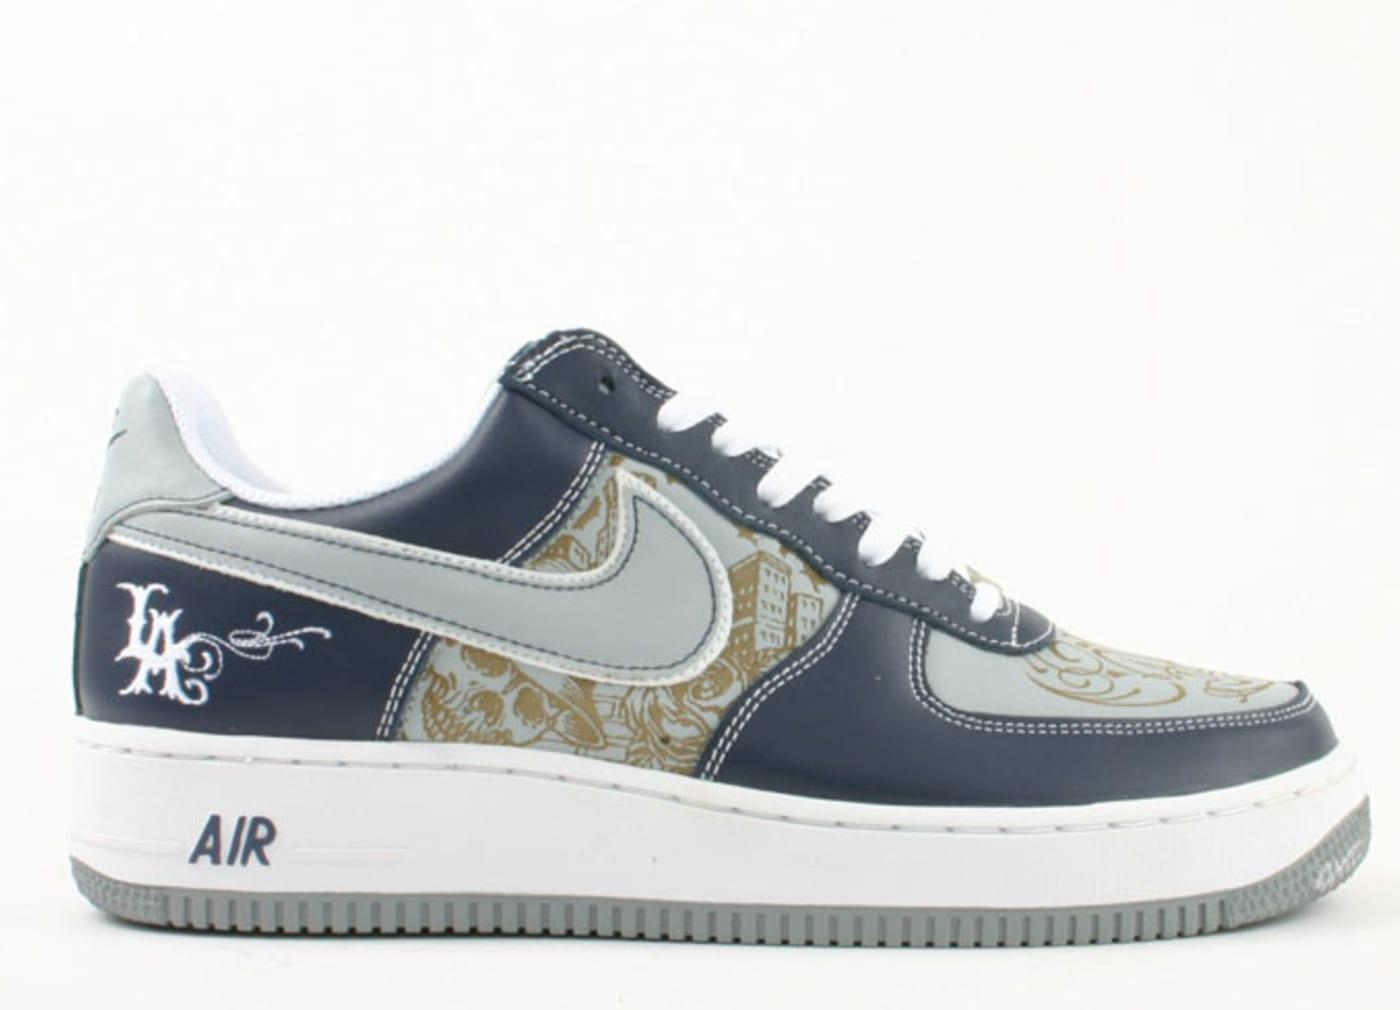 Mister Cartoon x Nike Air Force 1